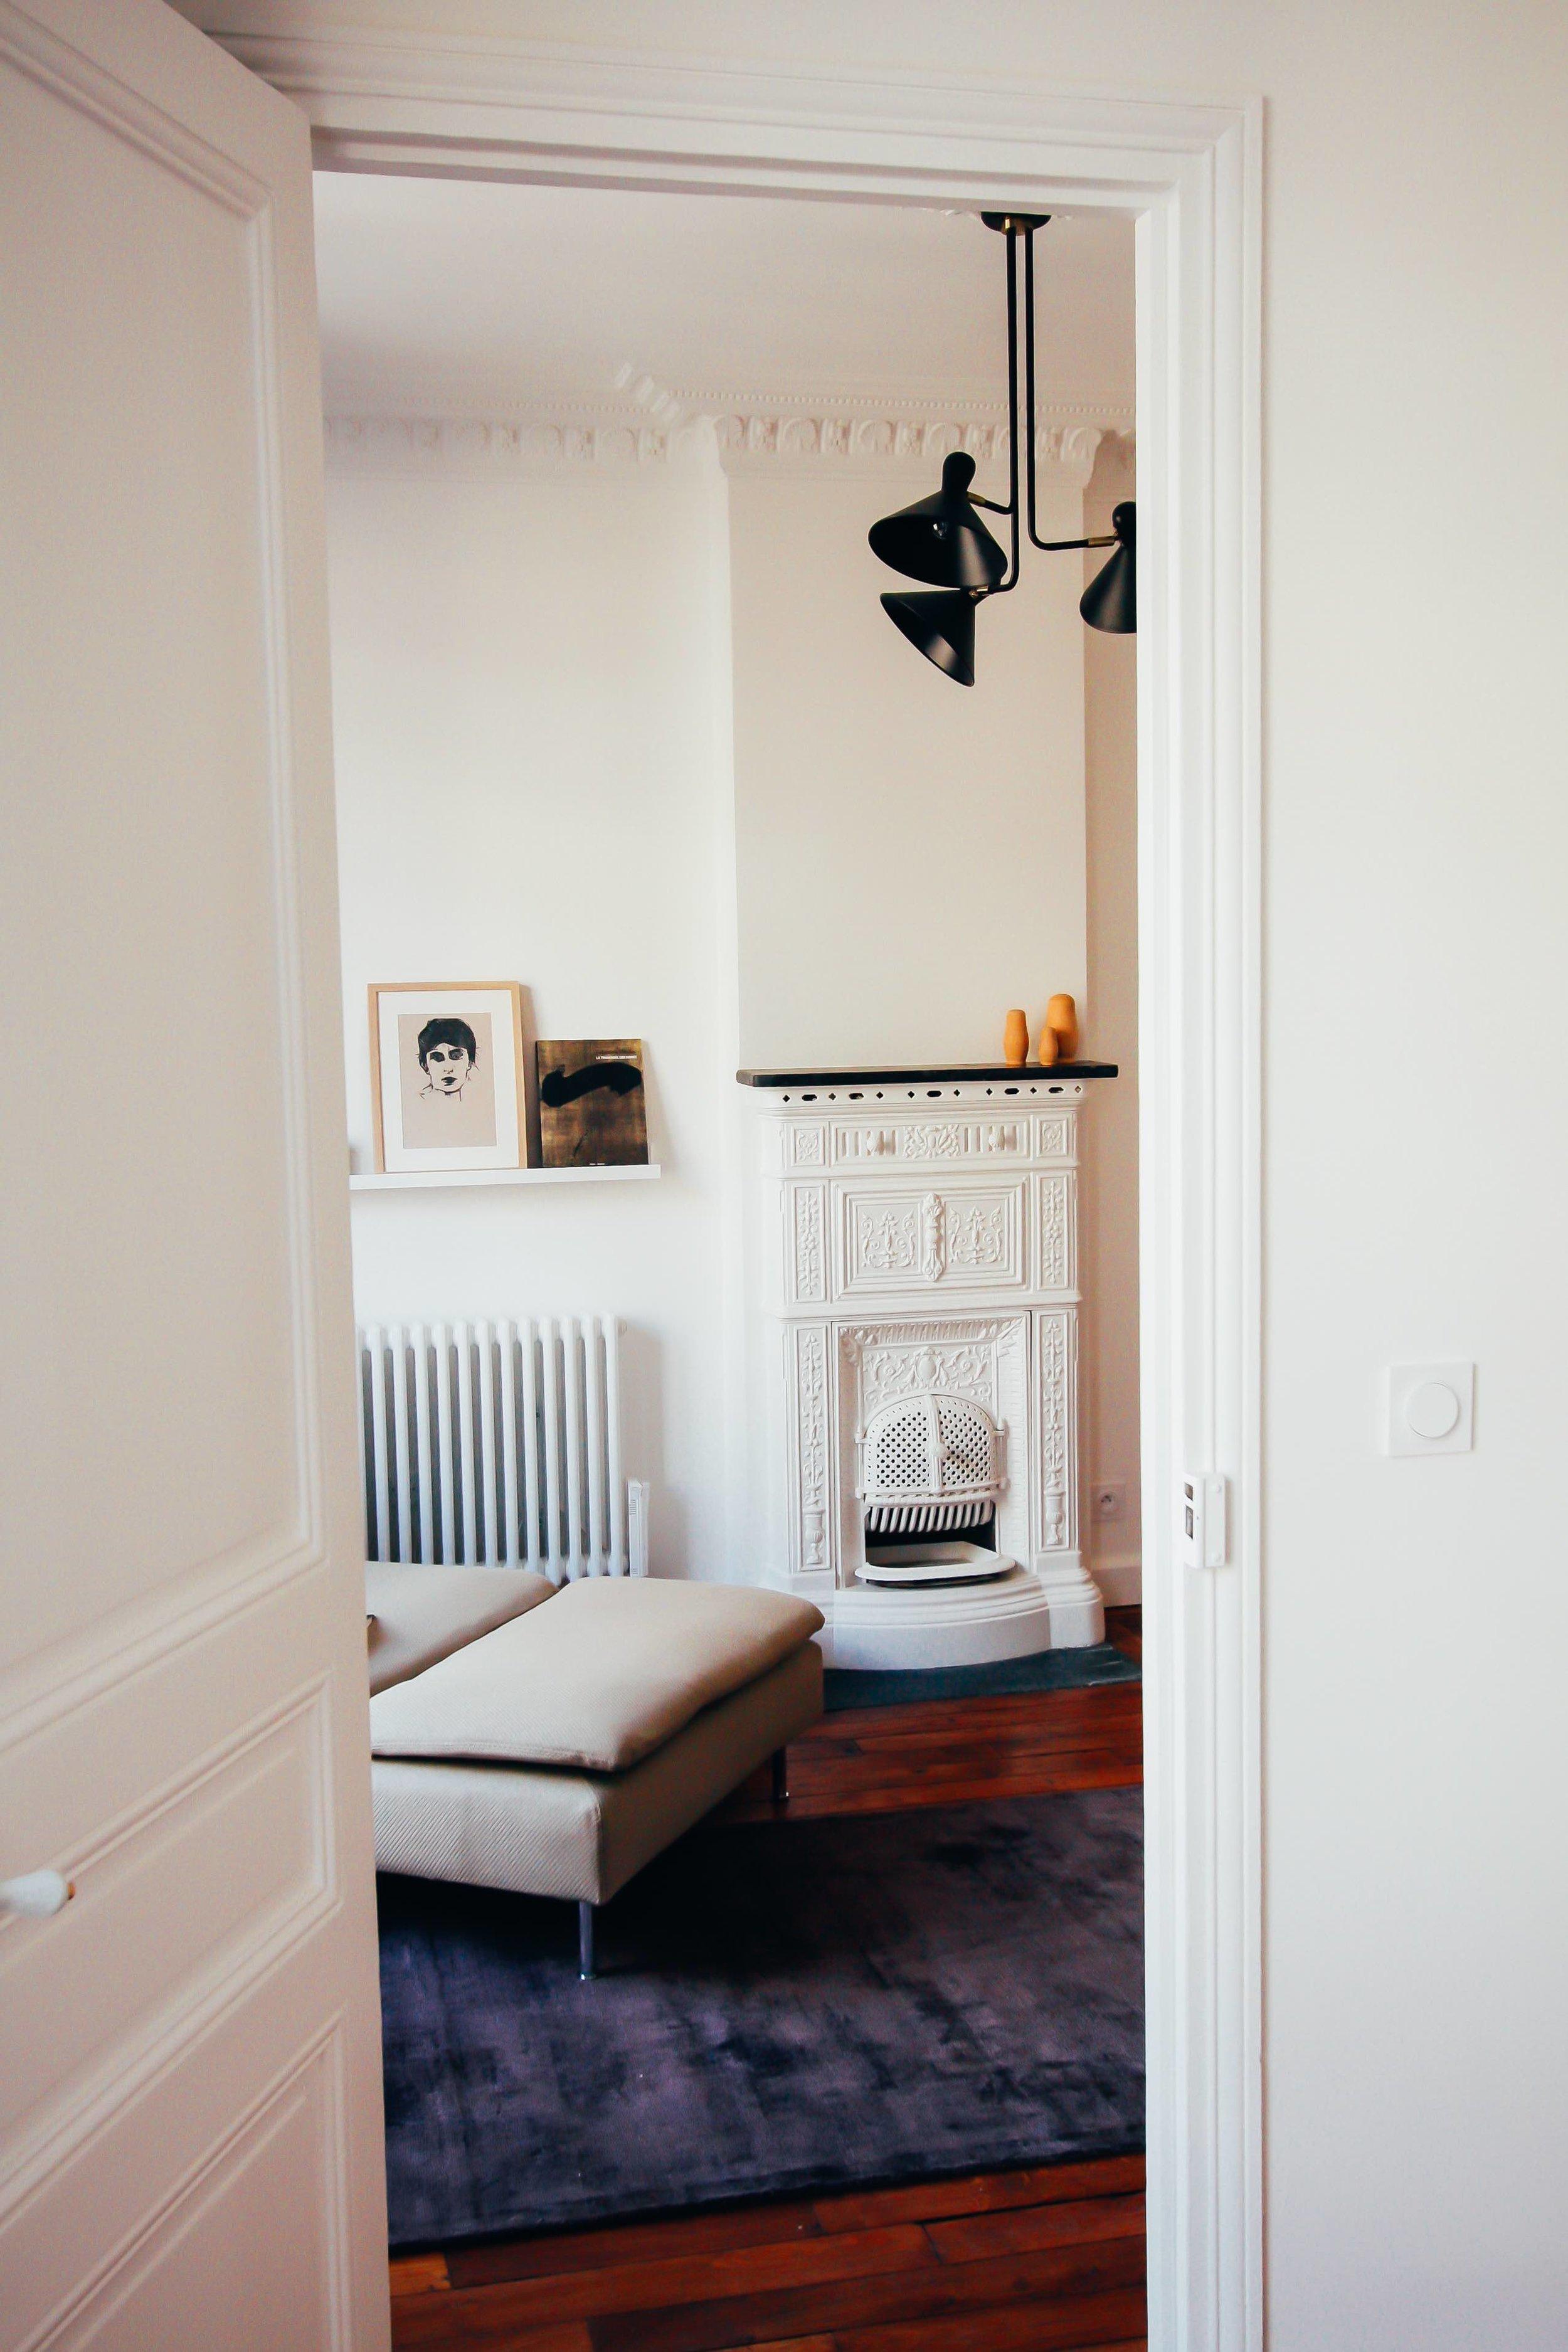 architecte-interieur-paris-terregrise-balard-5.jpg